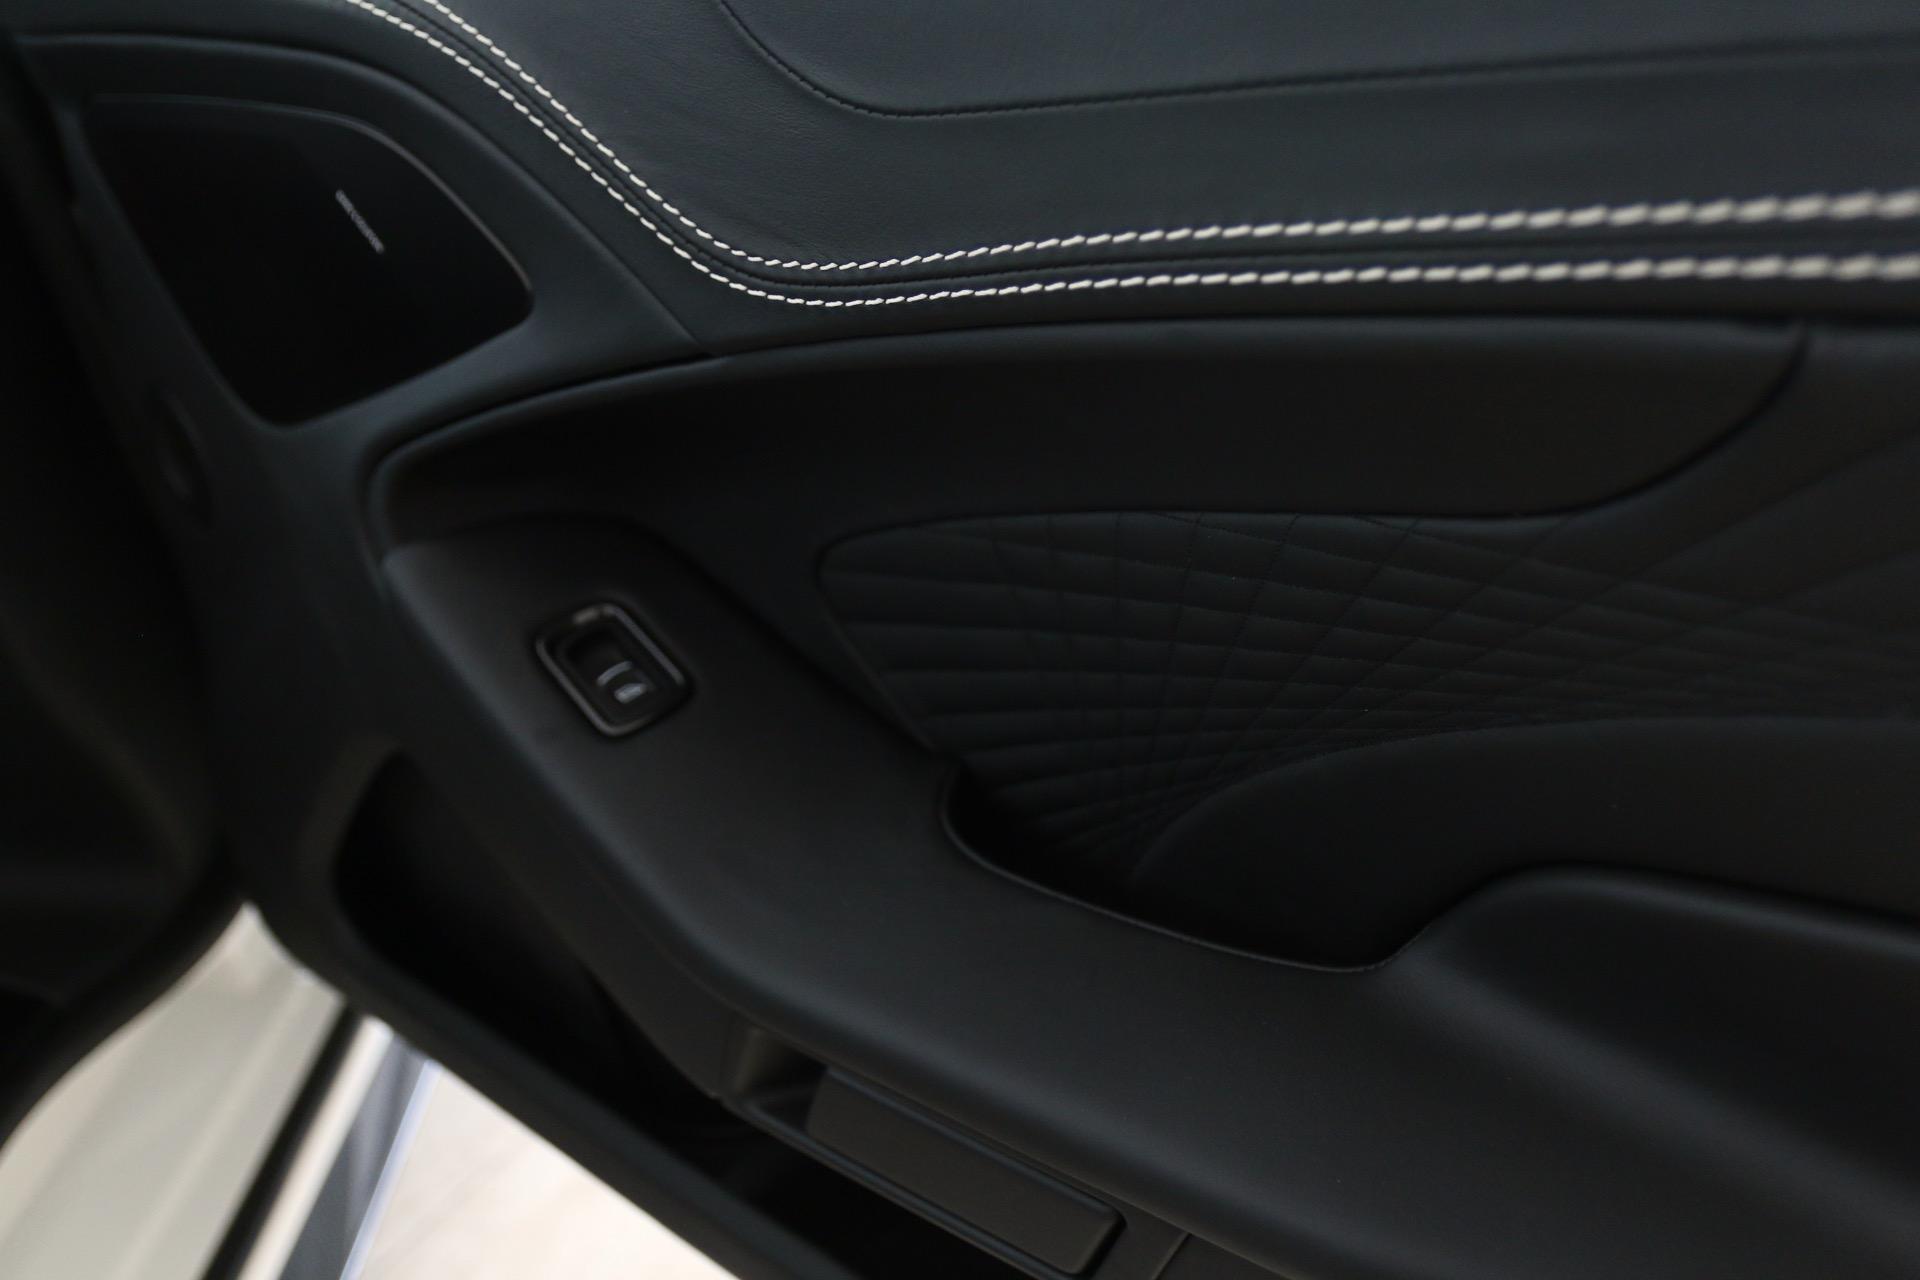 New-2018-Aston-Martin-Vanquish-Volante